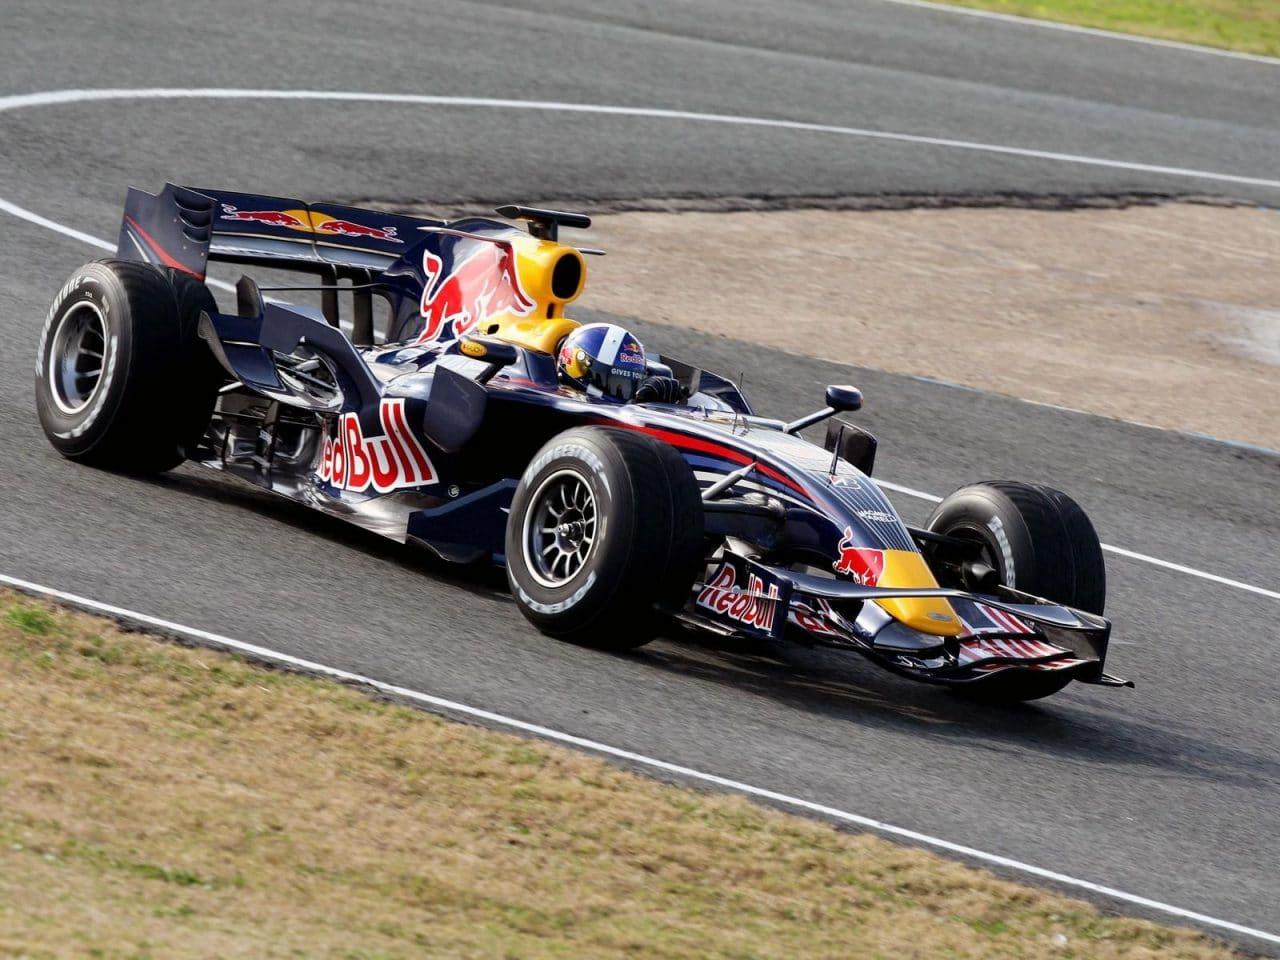 red bull renault rb4 2008 coulthard